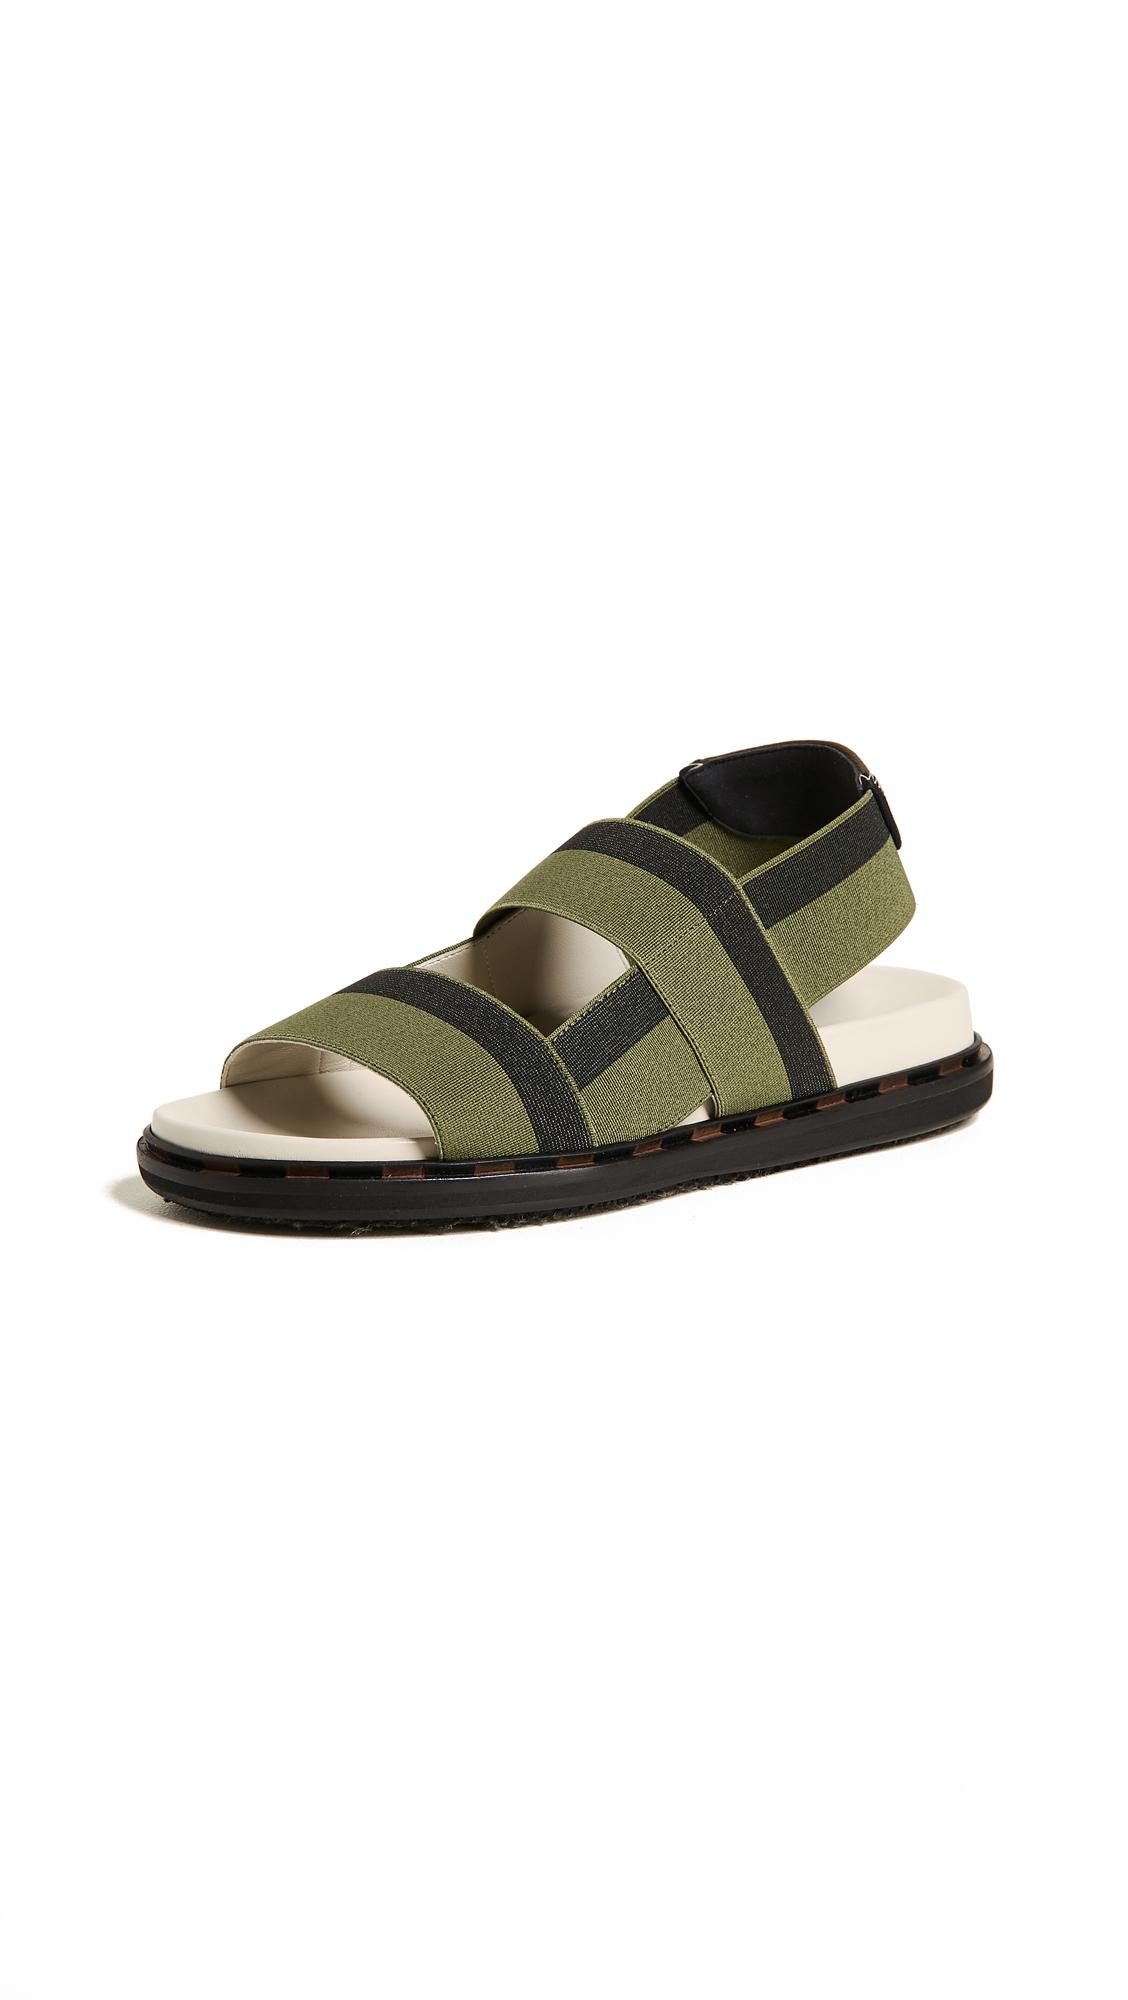 Marni Fussbett Sandals - Nero/Verde